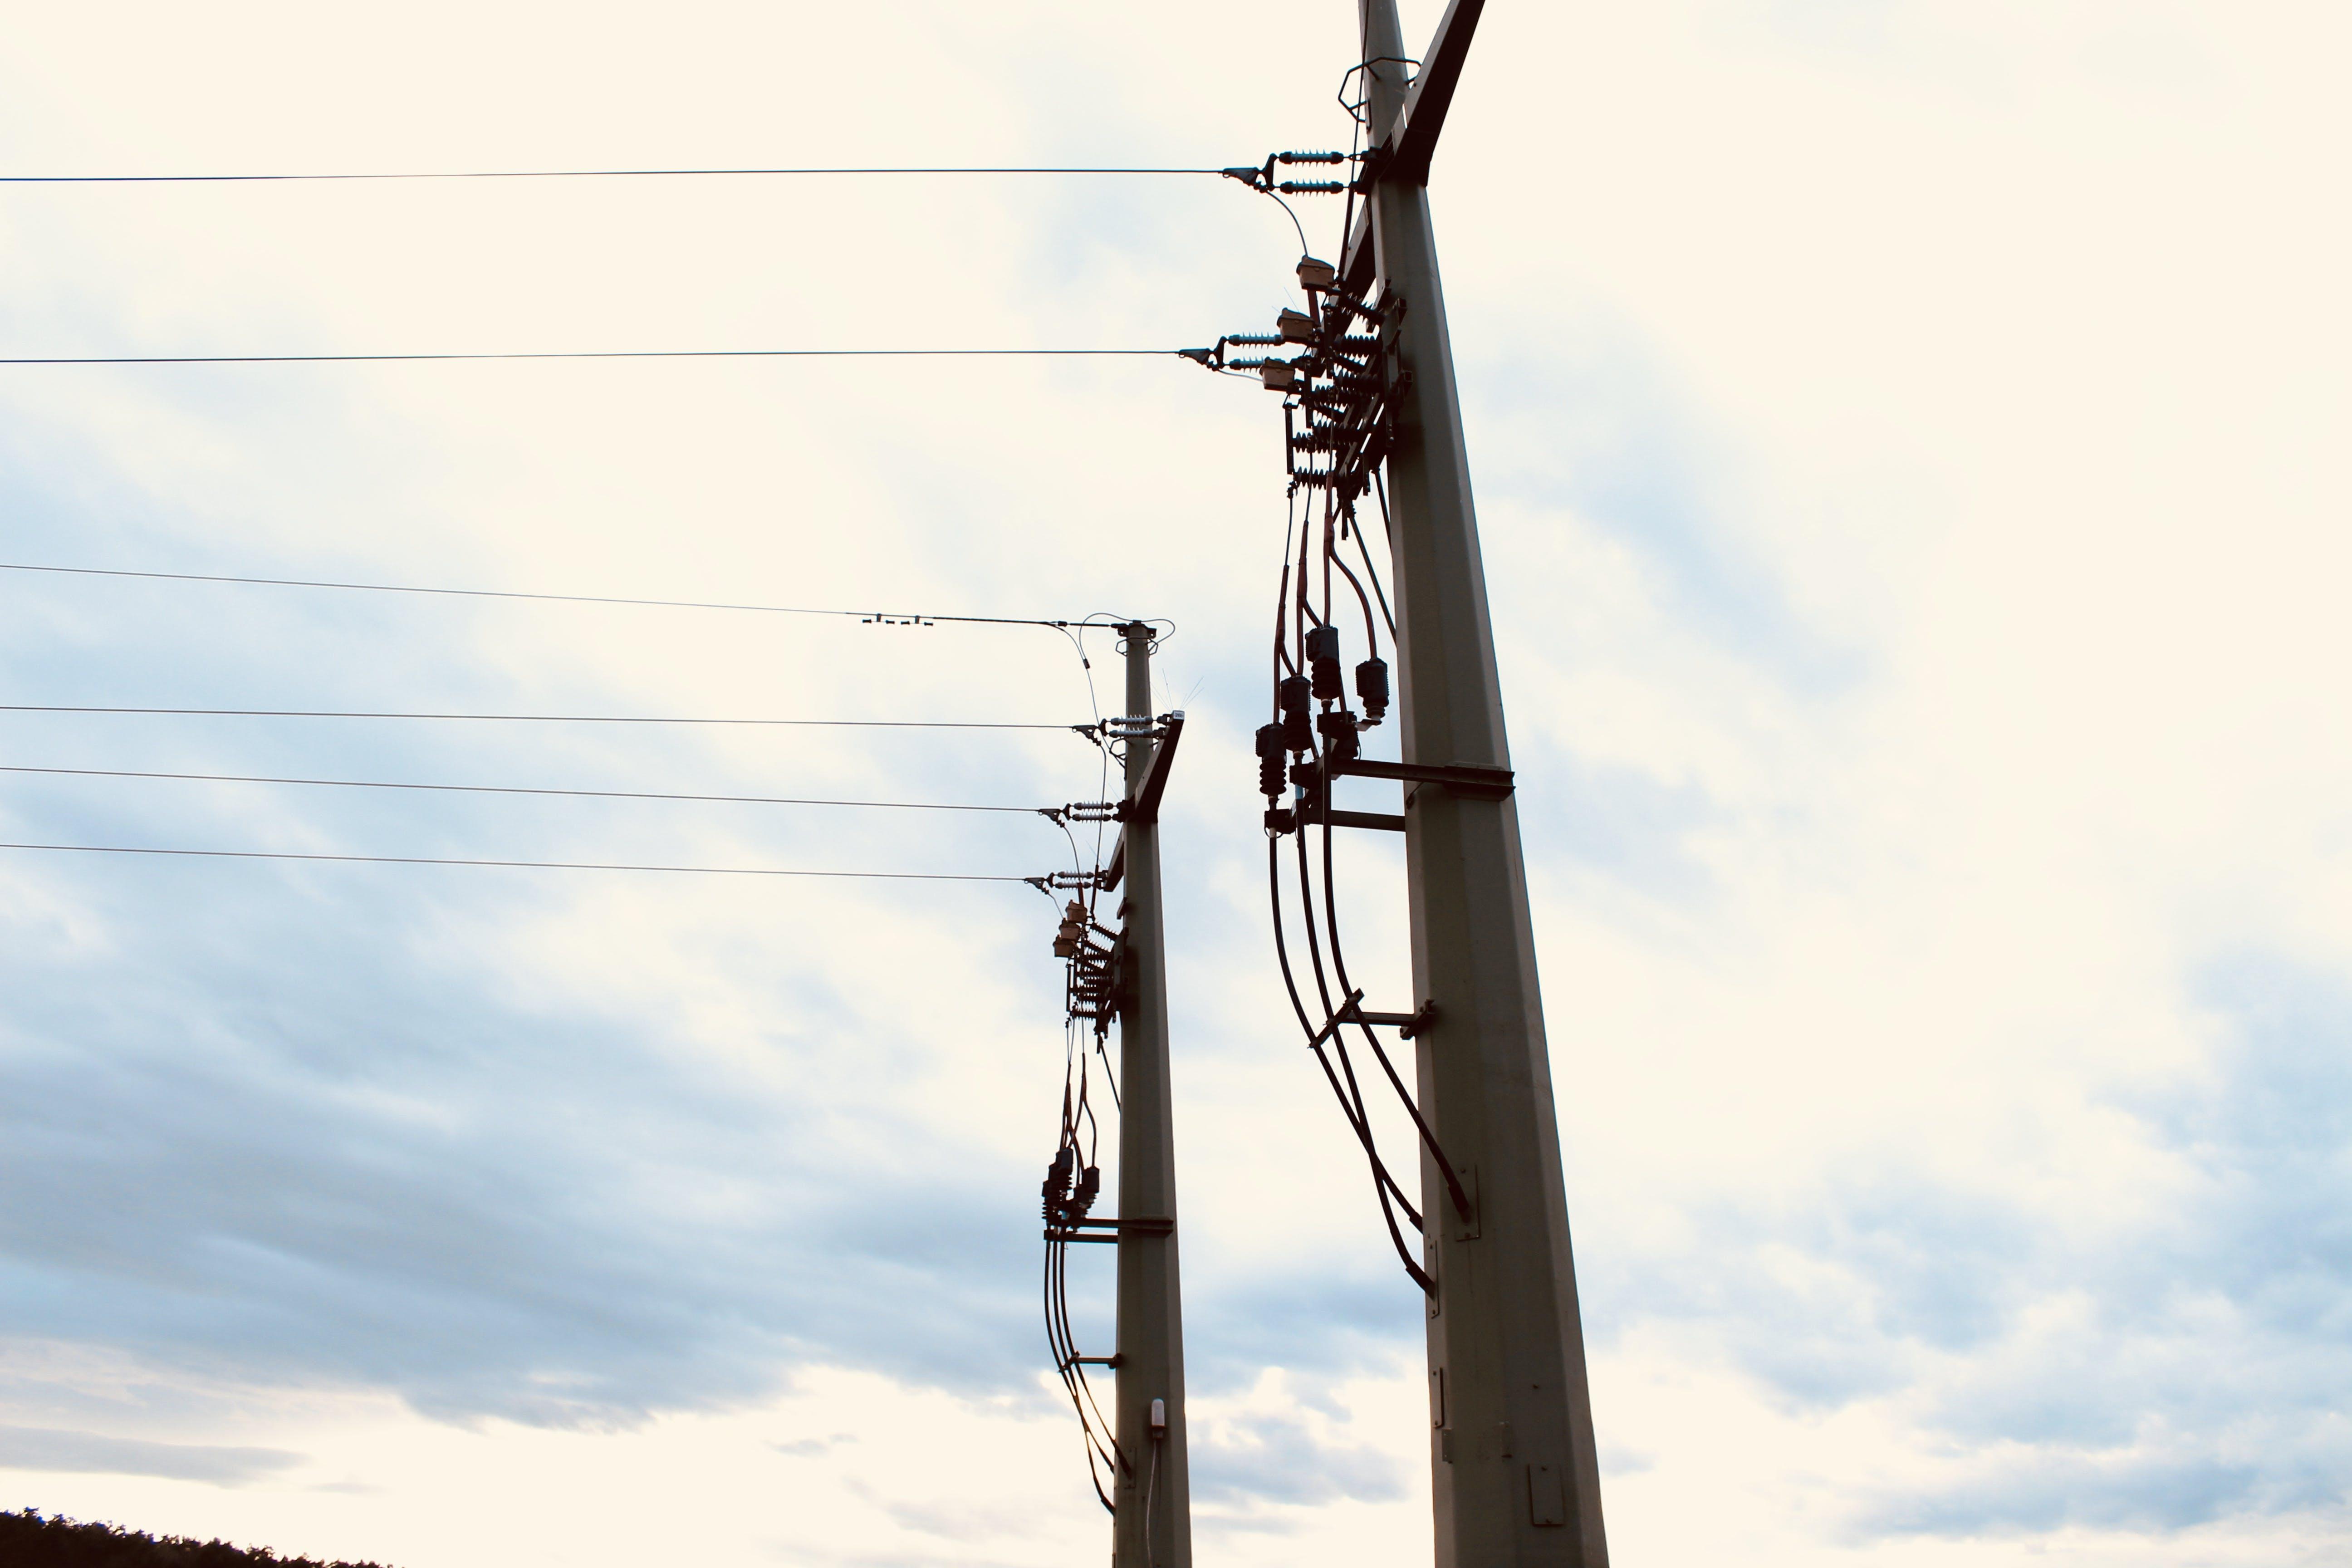 electric current, sun, wind